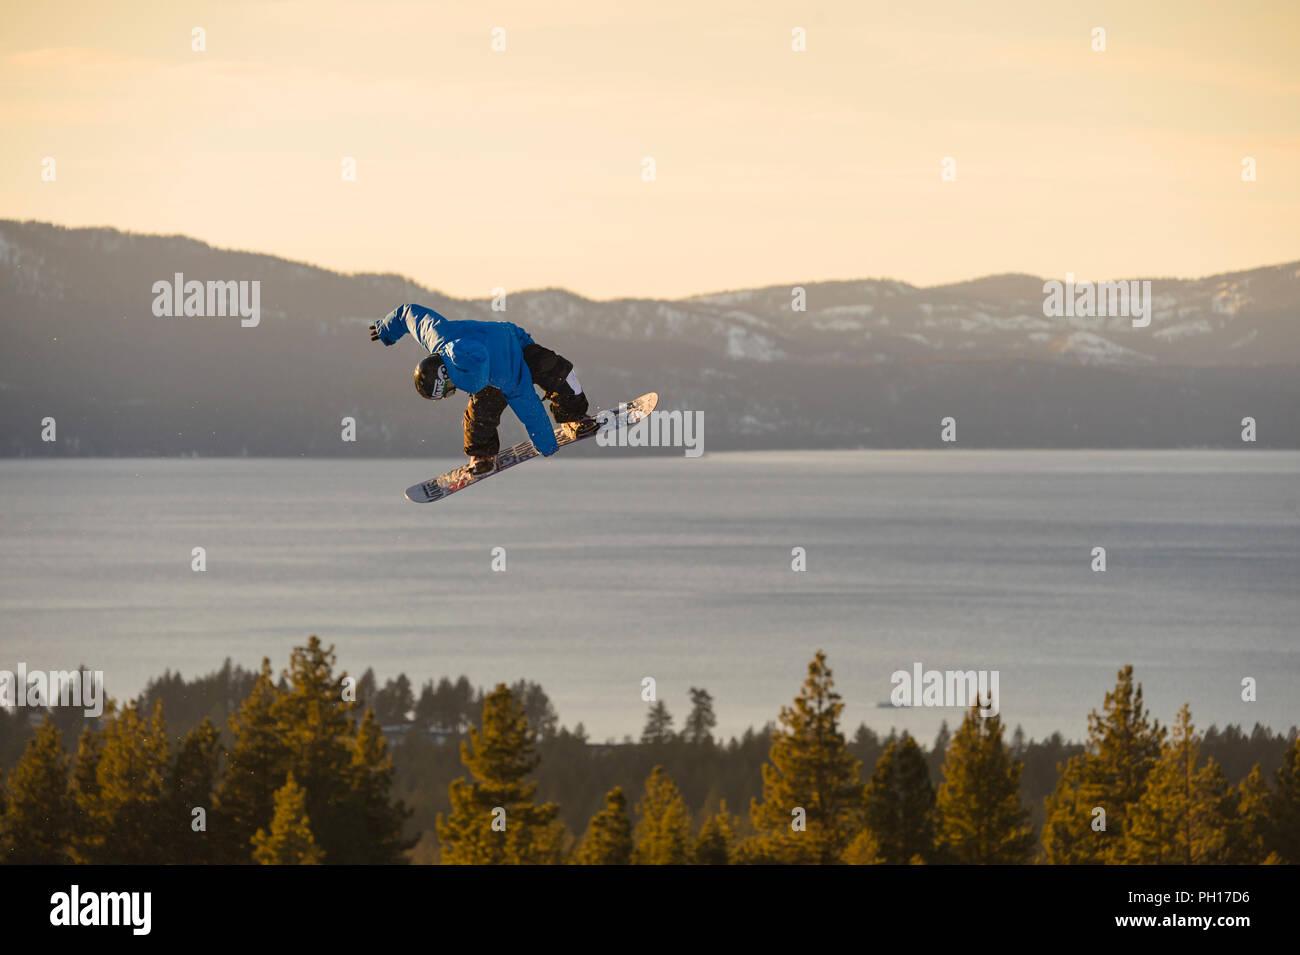 Big Air snowboard concorrenza a valle Heavenly Ski Resort in South Lake Tahoe, California, America del Nord Immagini Stock